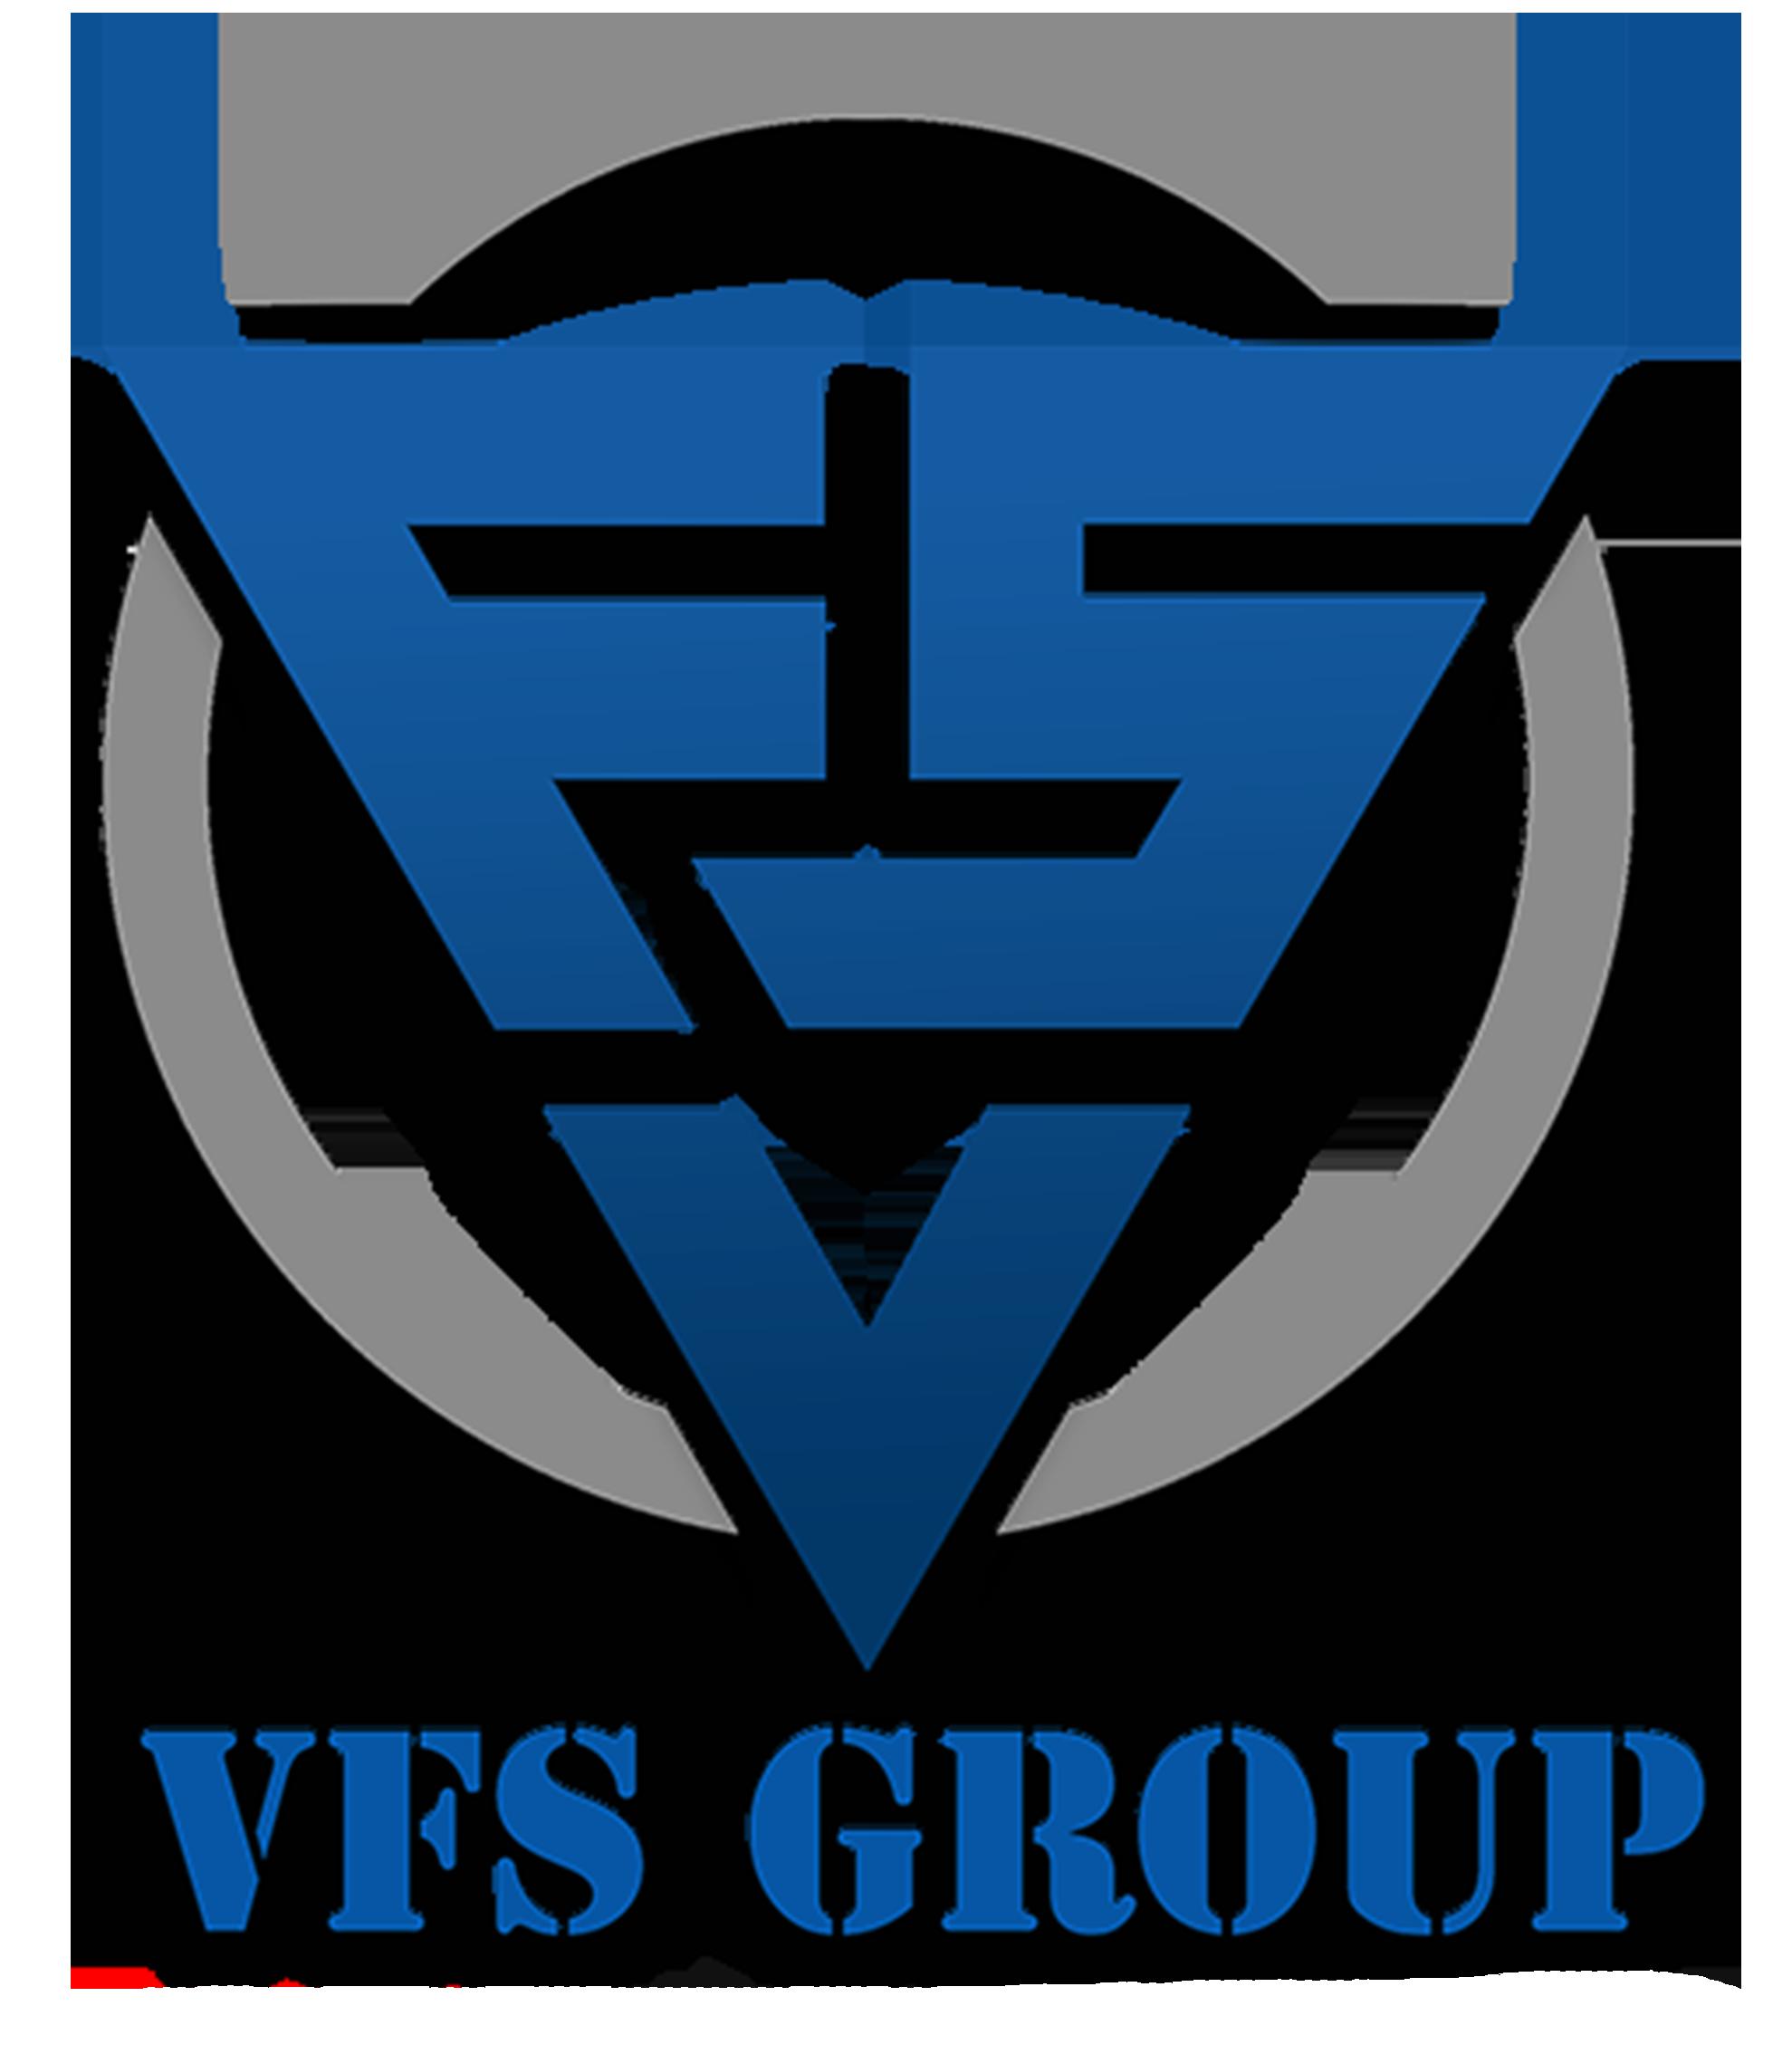 VFS Group